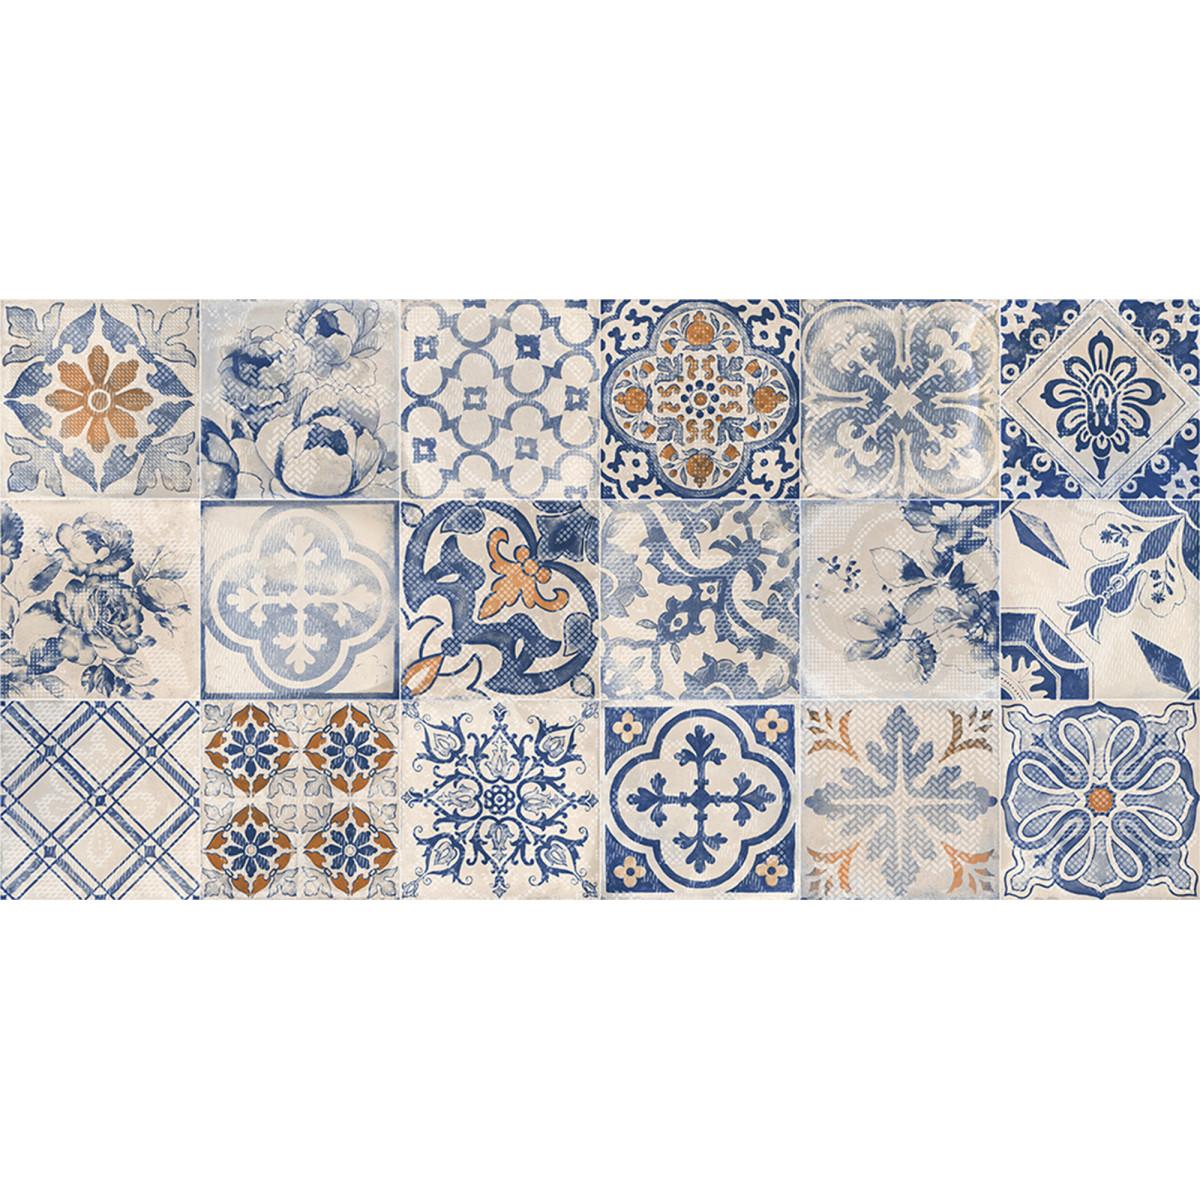 Плитка настенная Касабланка 19.8х39.8 см 1.58 м2 цвет синий